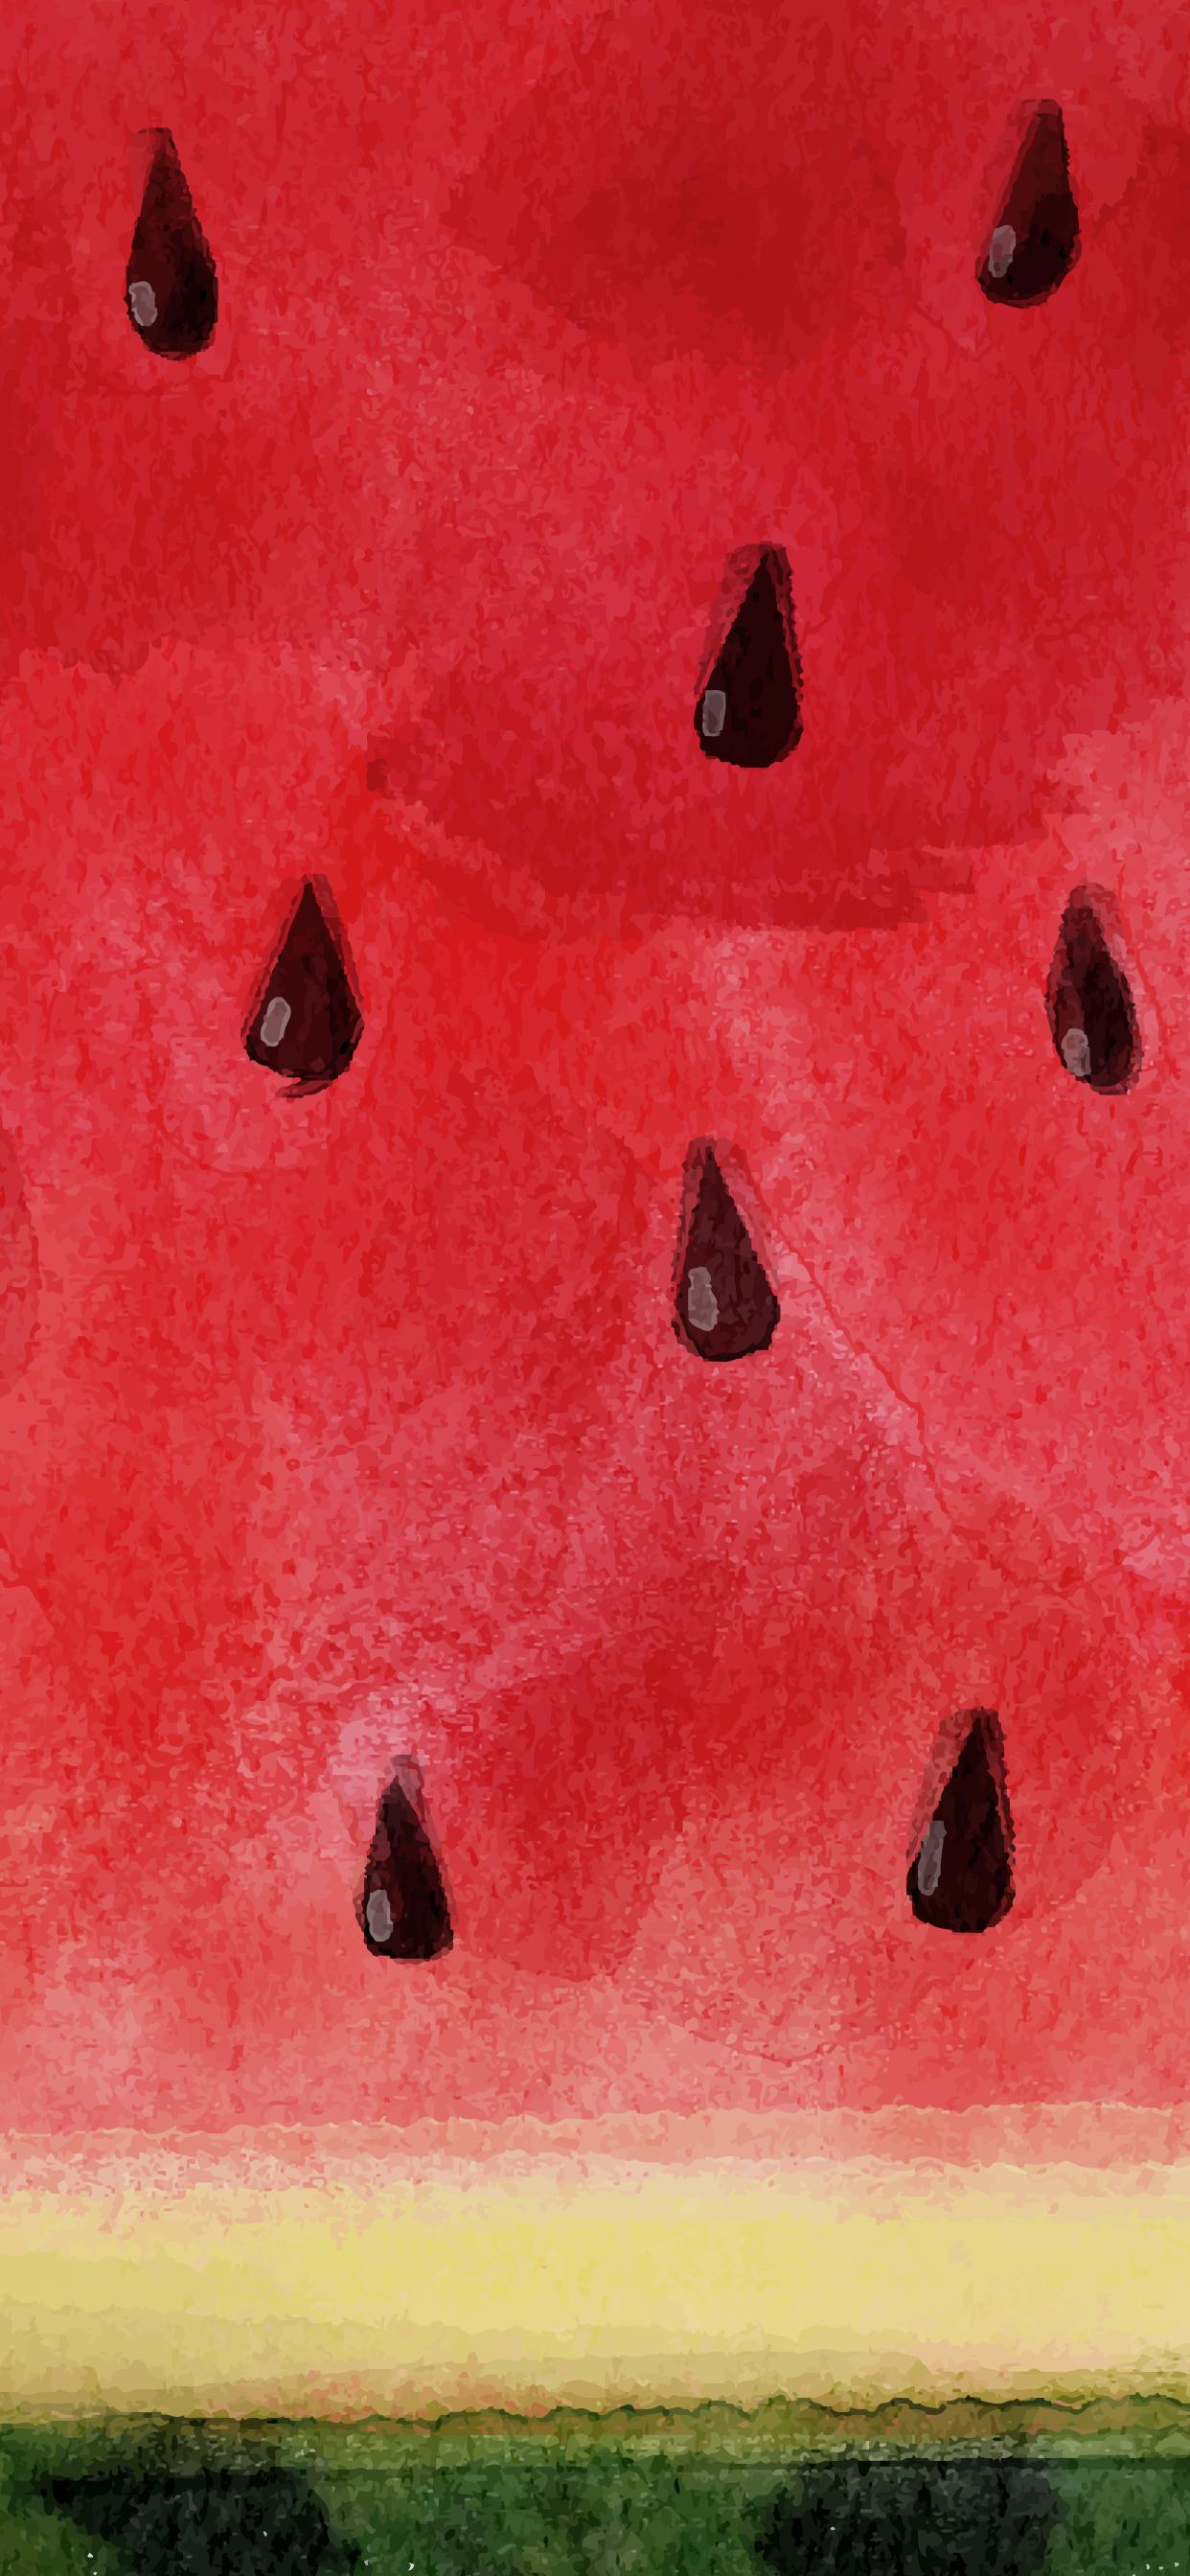 Watermelon wallpaper cute | HeroScreen - Cool Wallpapers